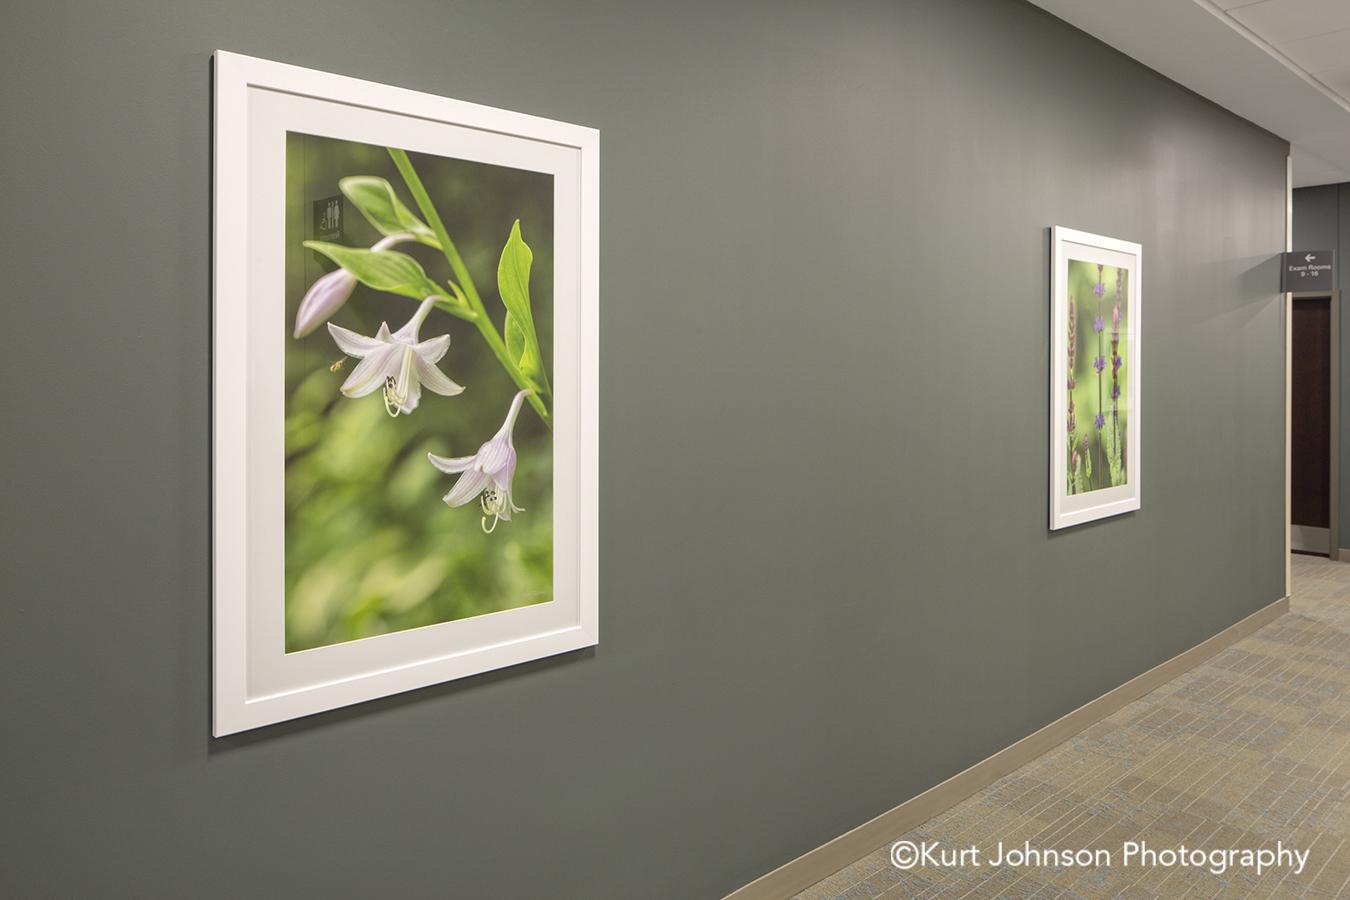 lauritzen white frame matte framed flower botanical nature art install flowers hallway corridor installation